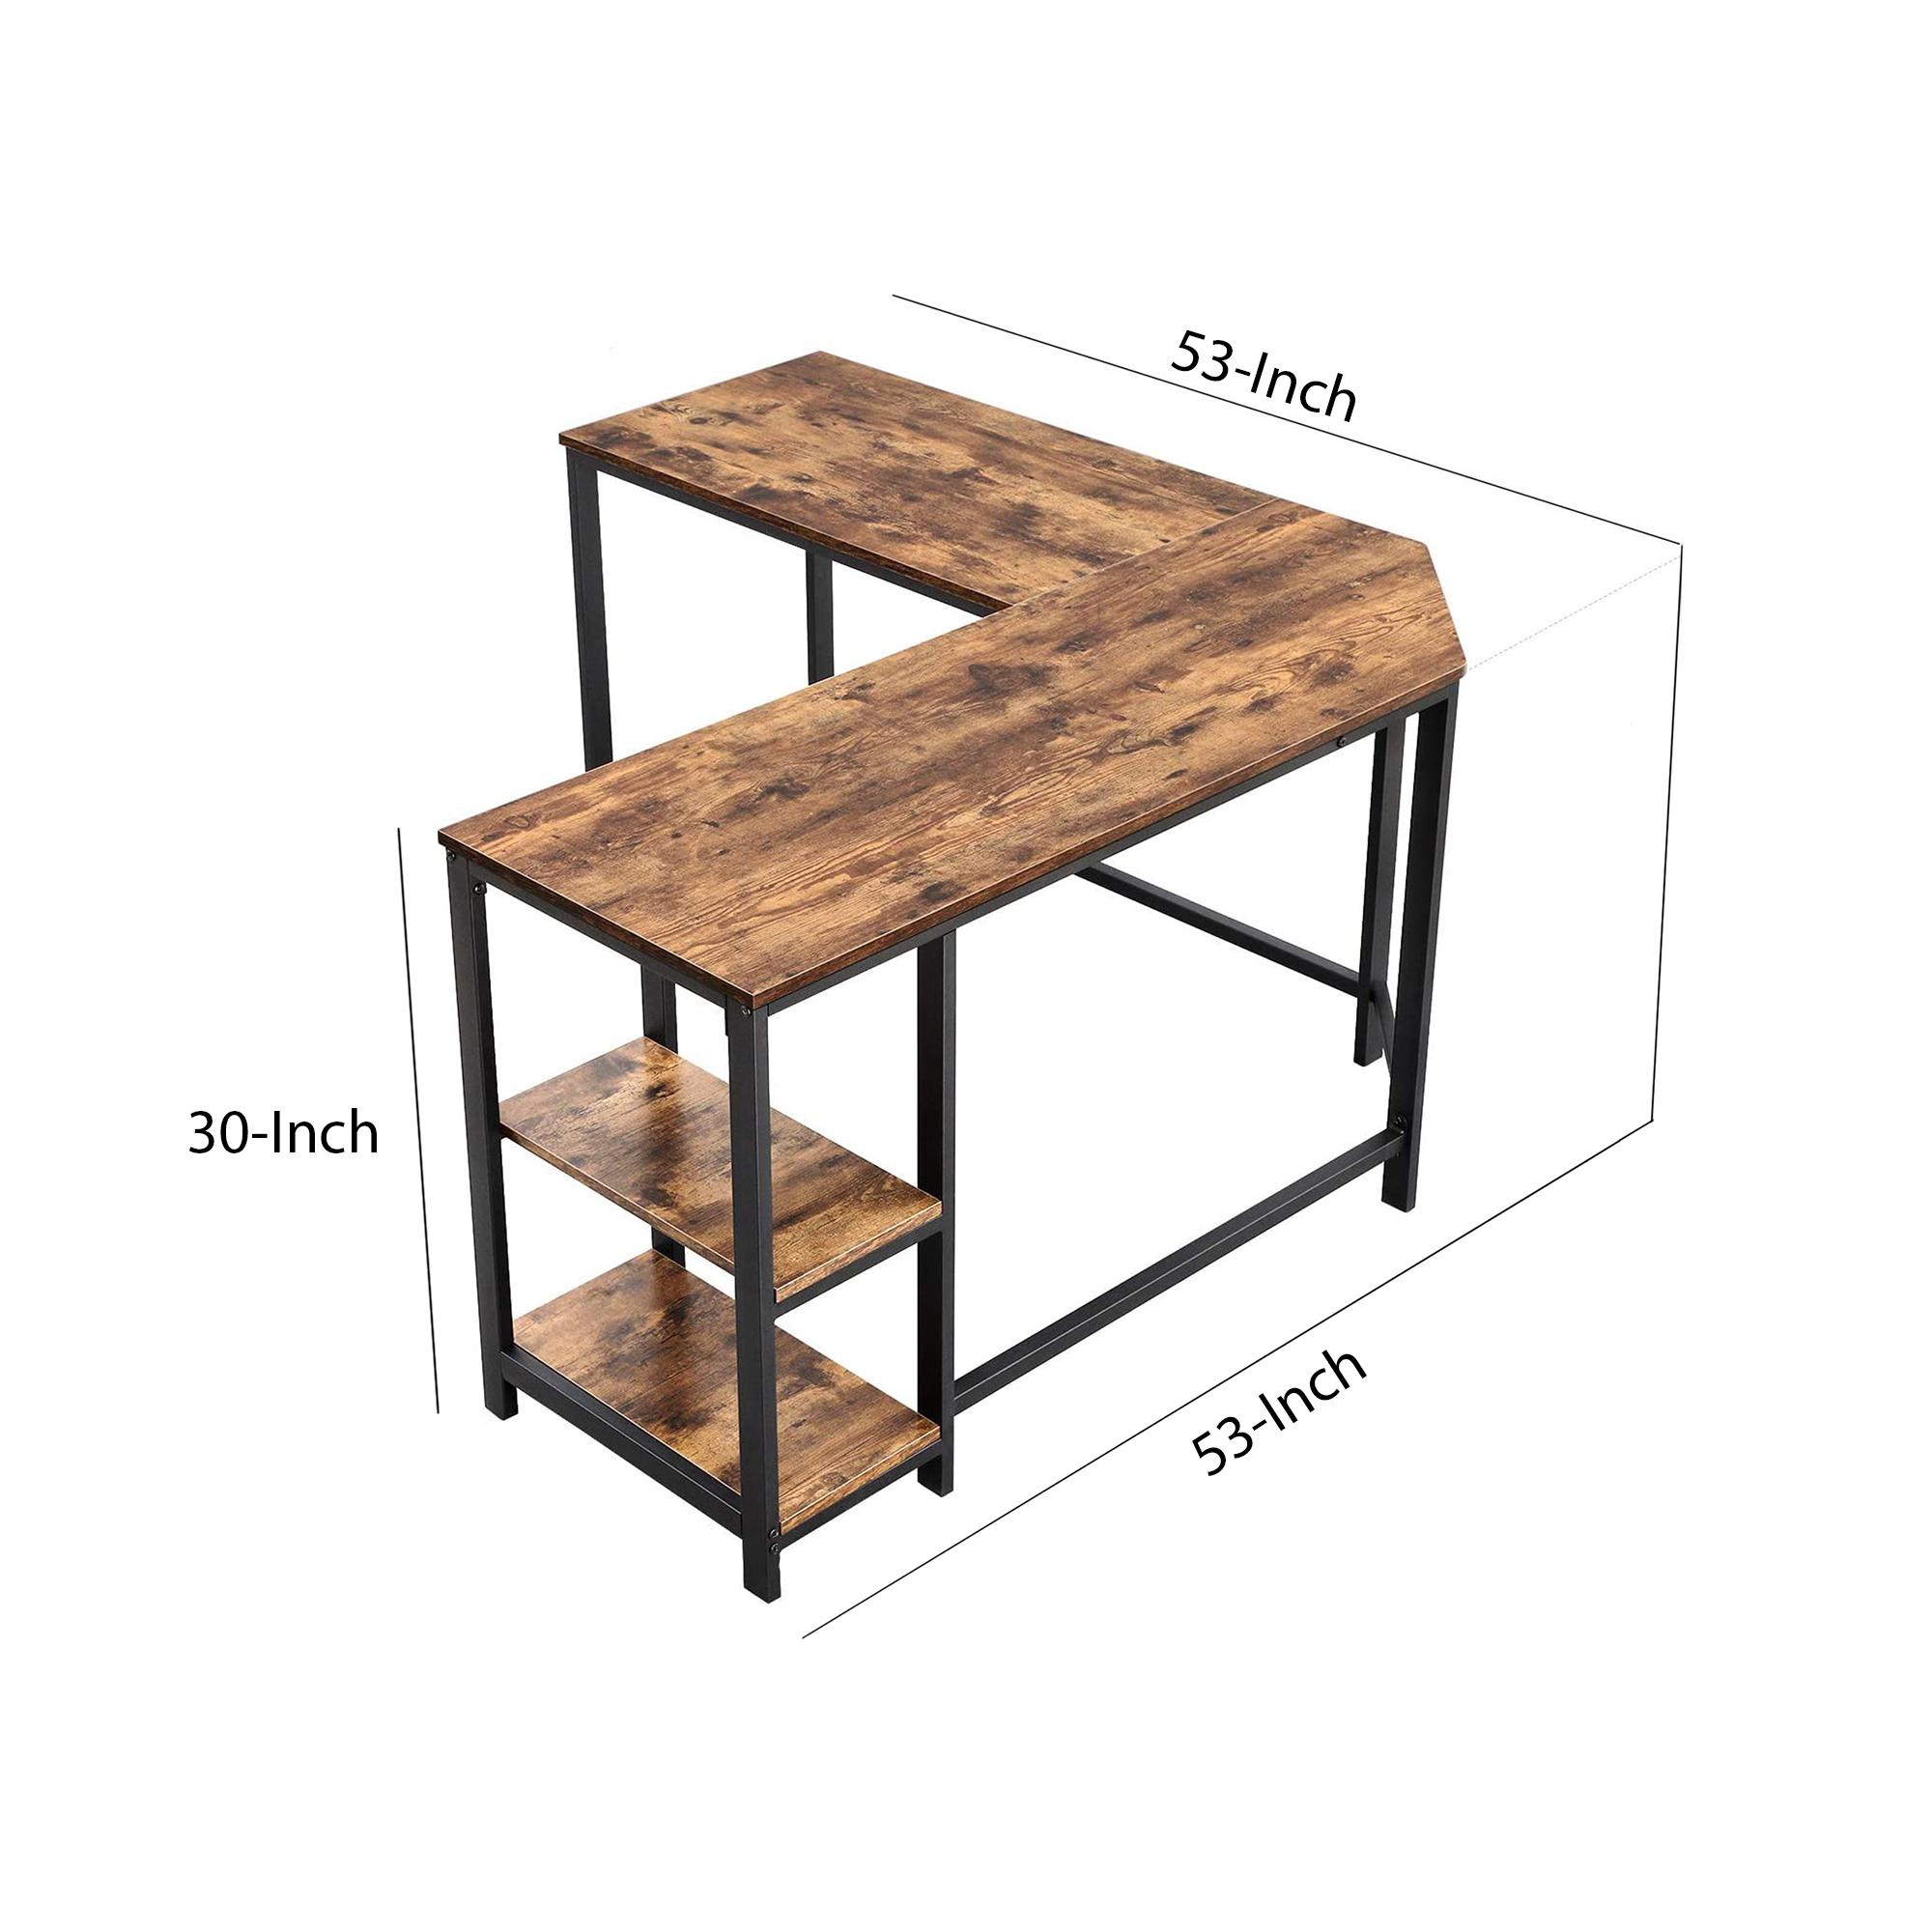 Computer Desk Wood And Metal Frame L-Shape With 2 Shelves